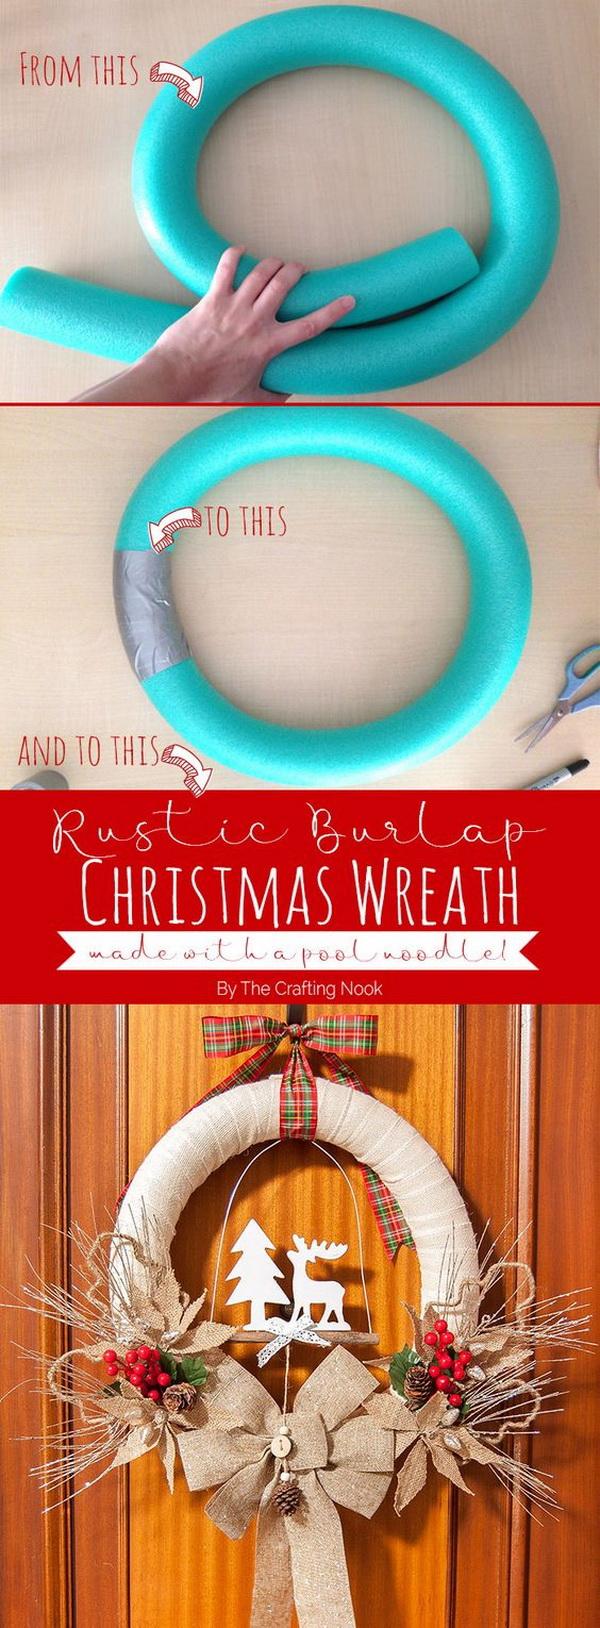 Rustic Burlap Christmas Wreath.